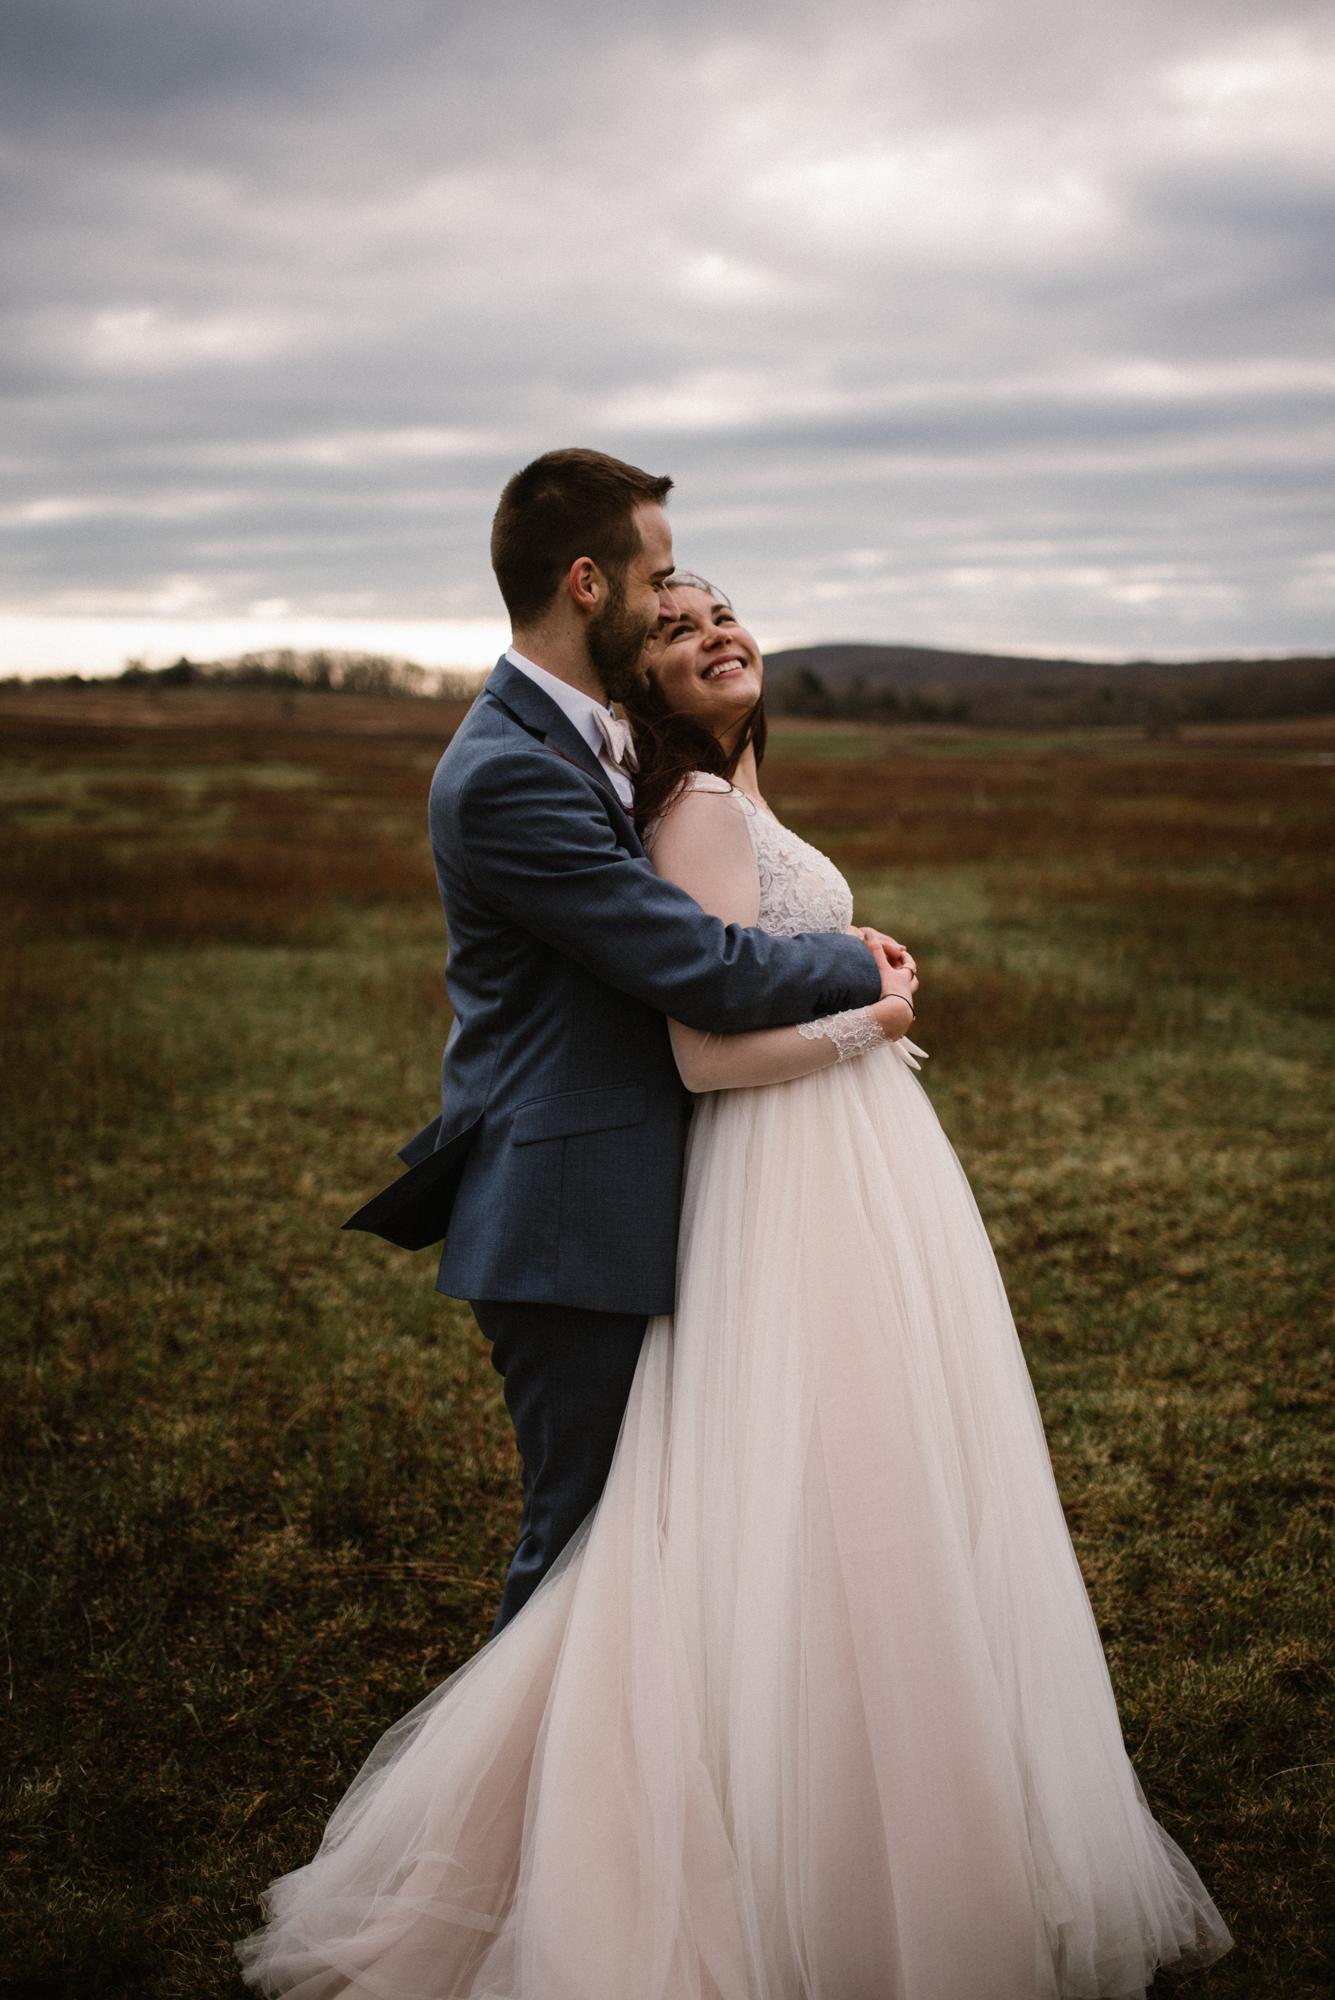 Paula and Andrew - Small Adventurous Wedding in Shenandoah National Park - Blue Ridge Mountain Wedding - White Sails Creative - Mountain Elopement_34.jpg